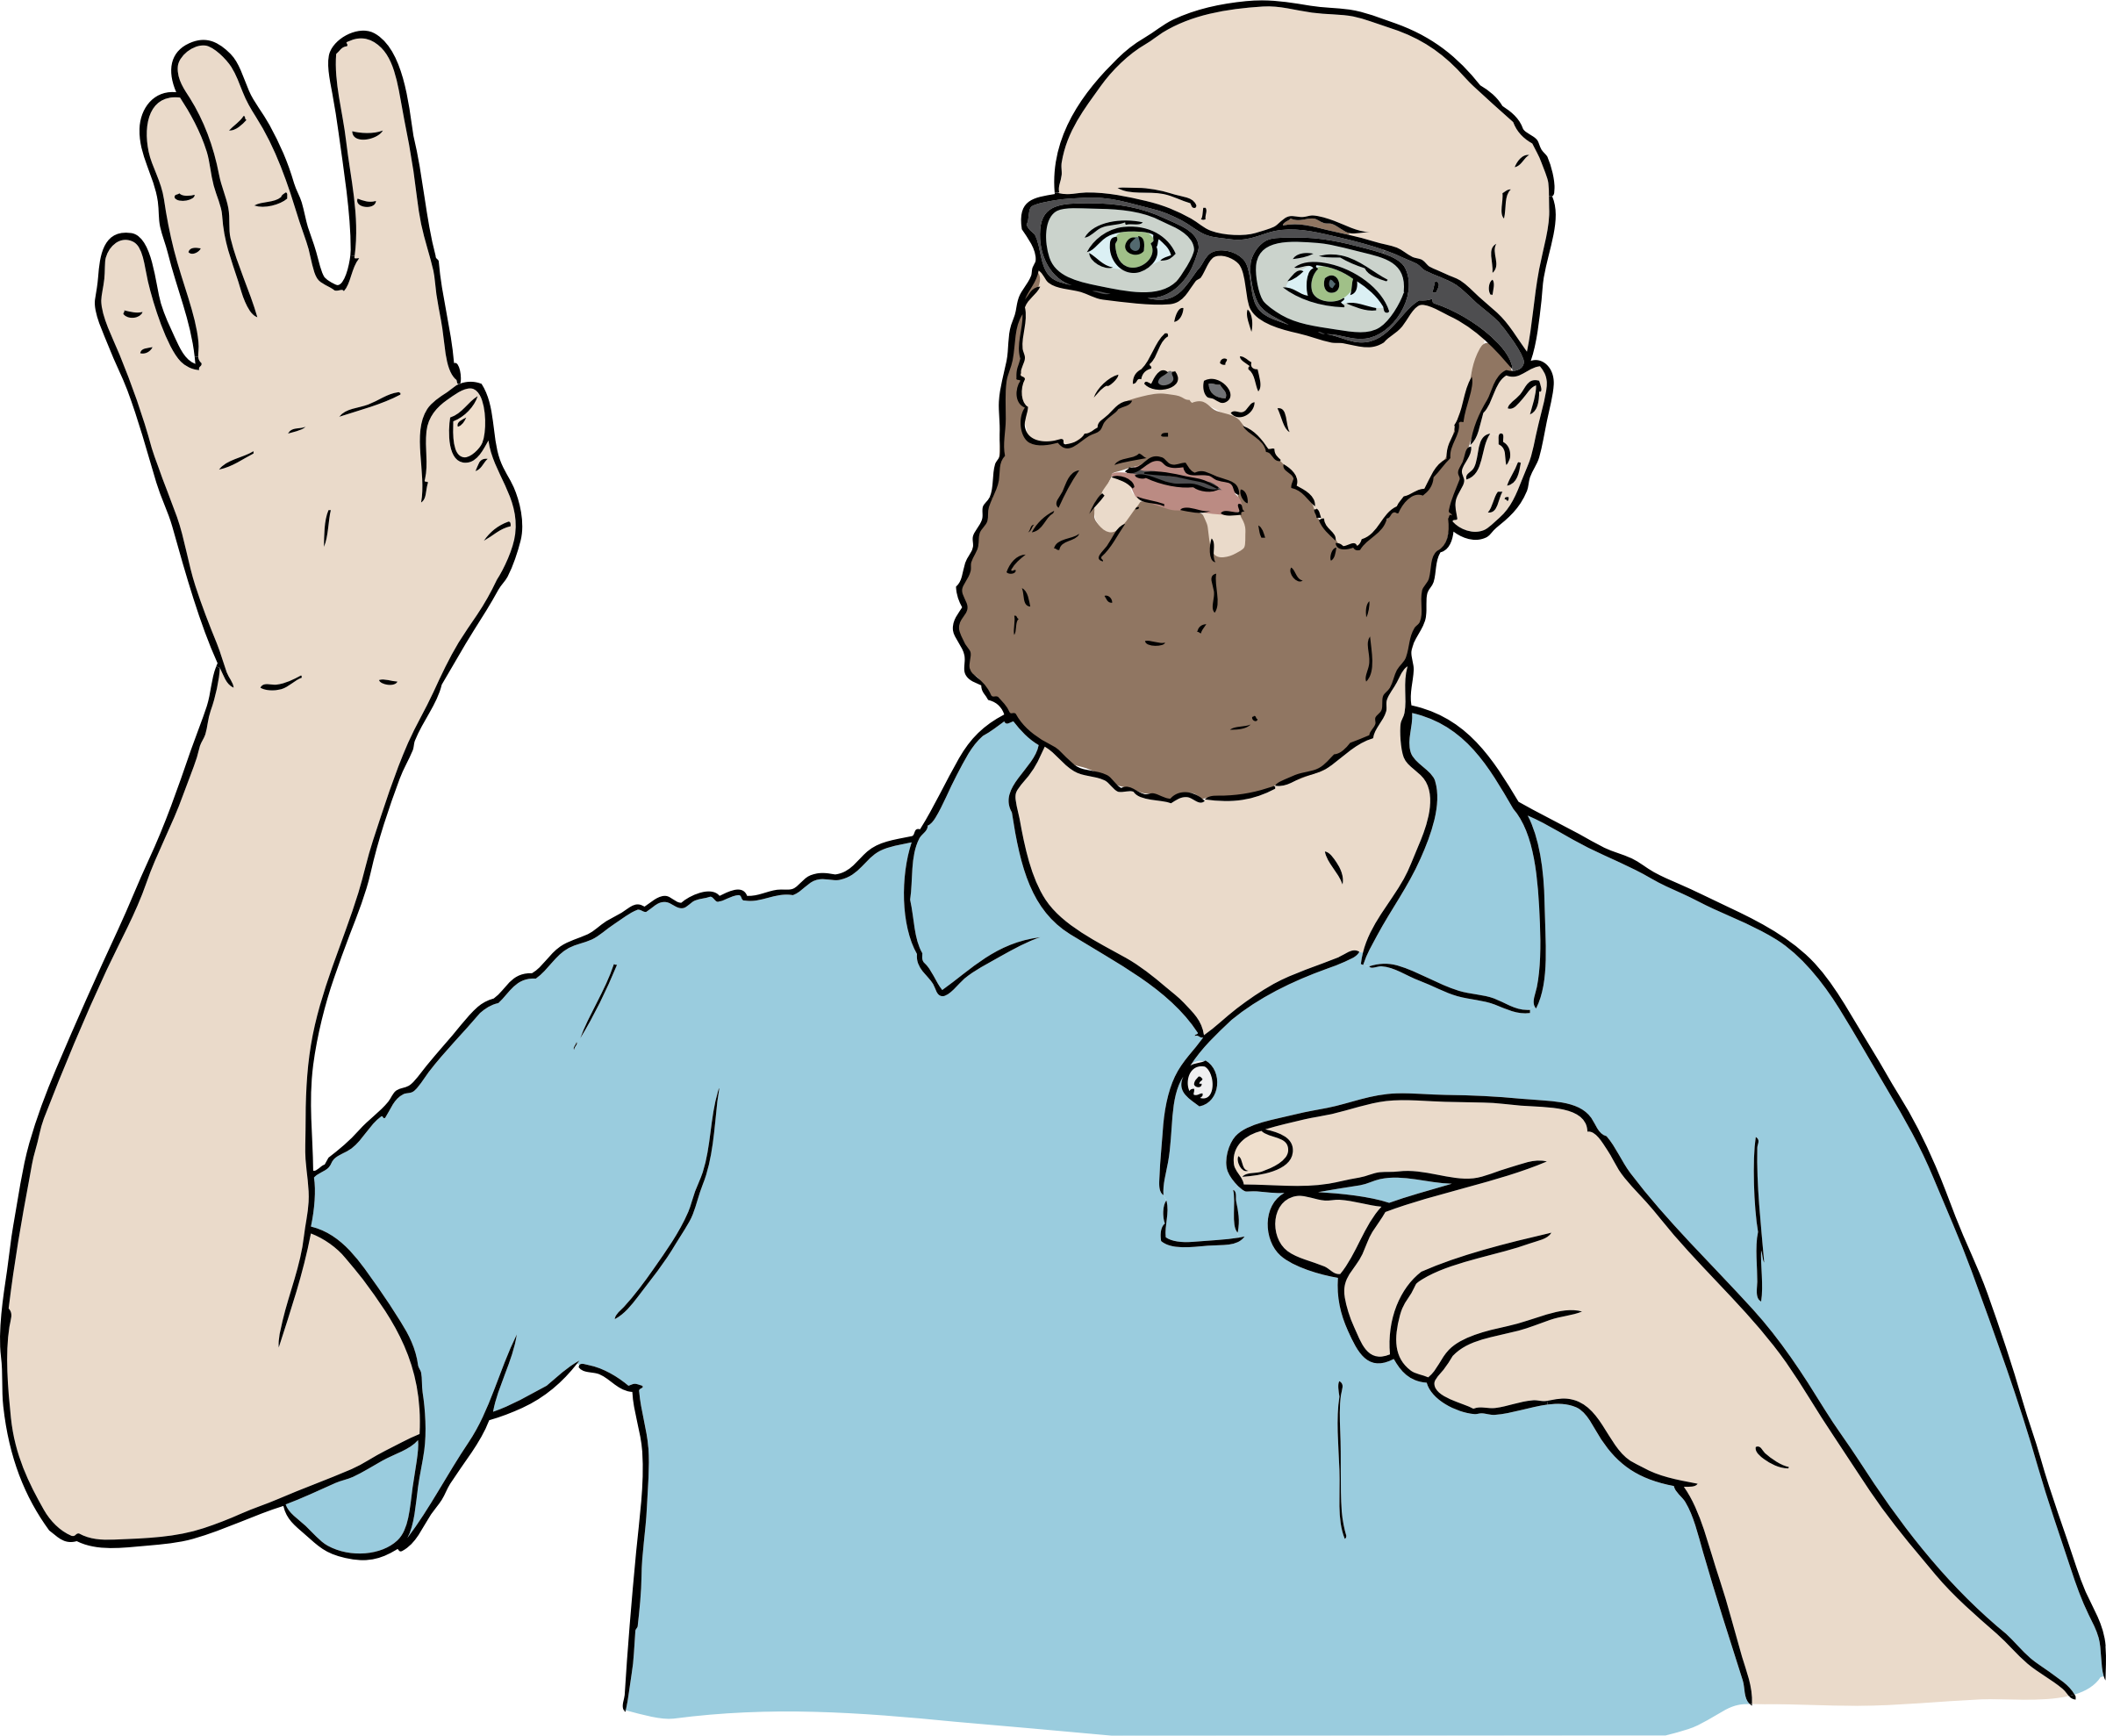 Hands clipart self. Lambert hand up icons